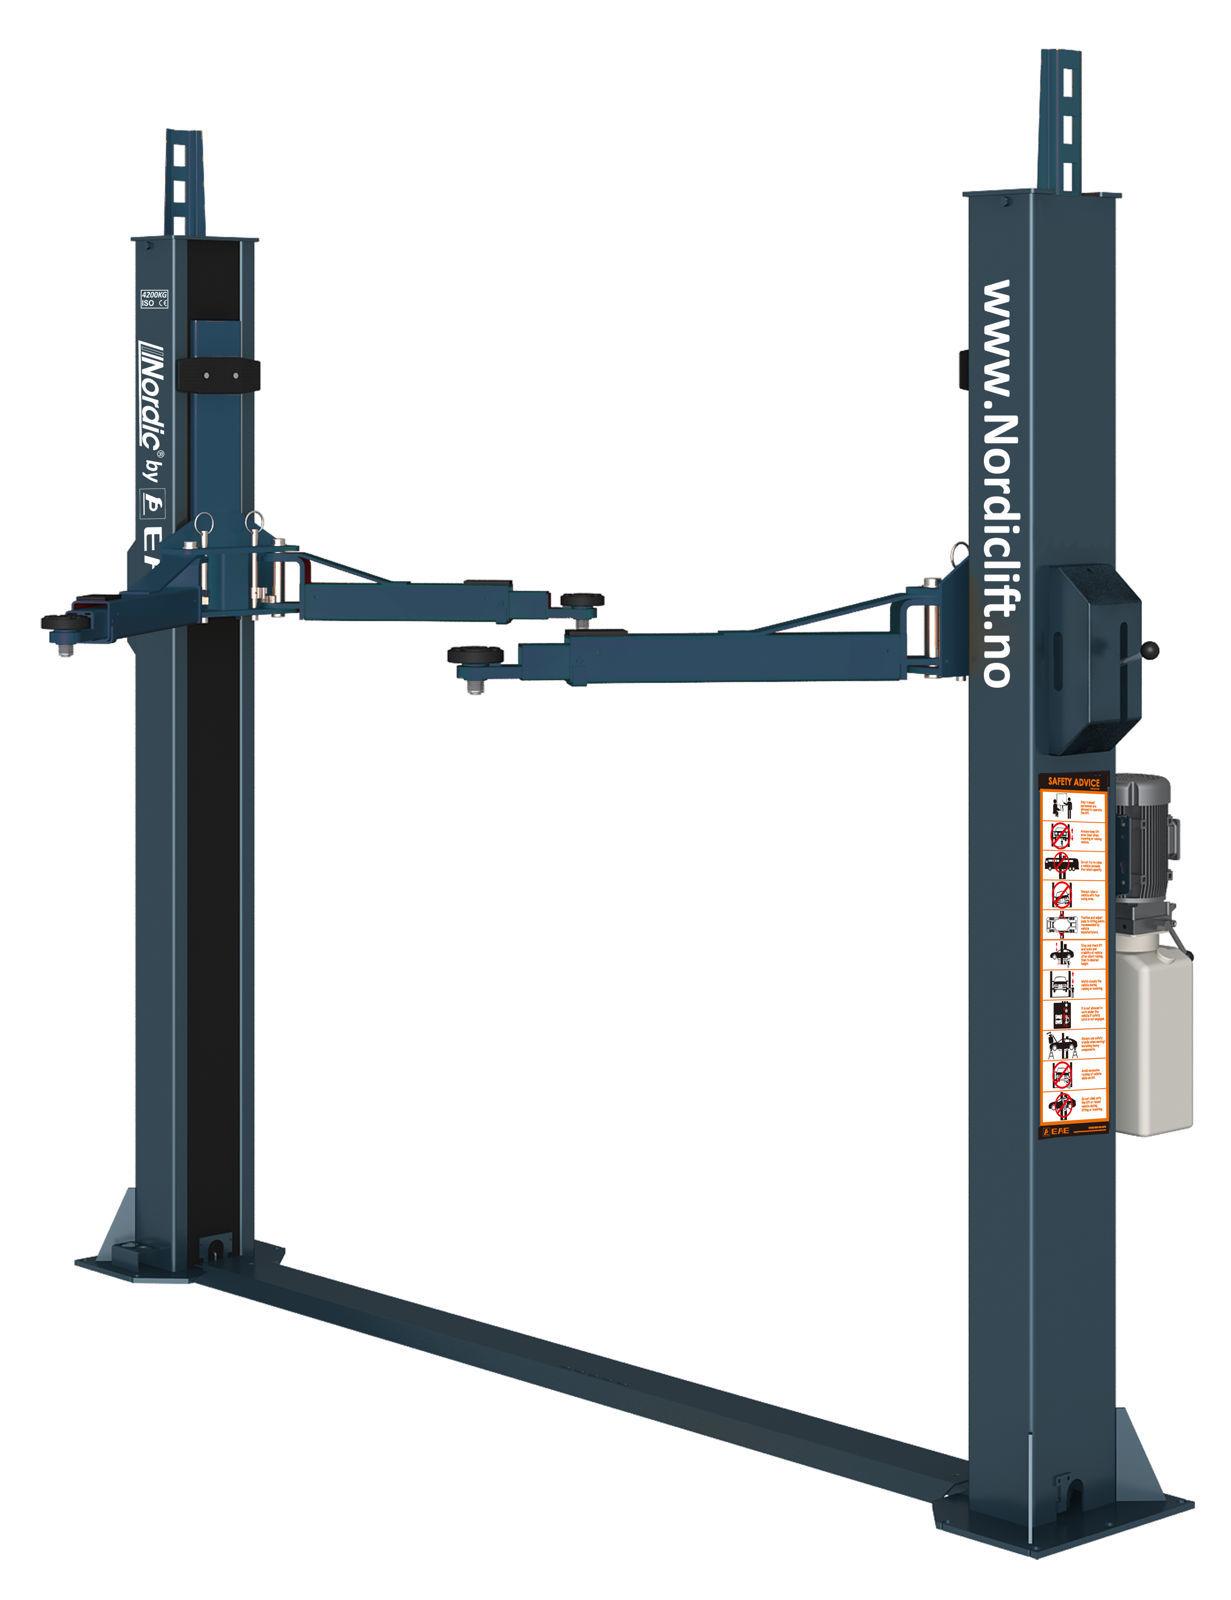 F10M 2-søylet løftebukk 4,2 tonn m/bunnramme 1-fas